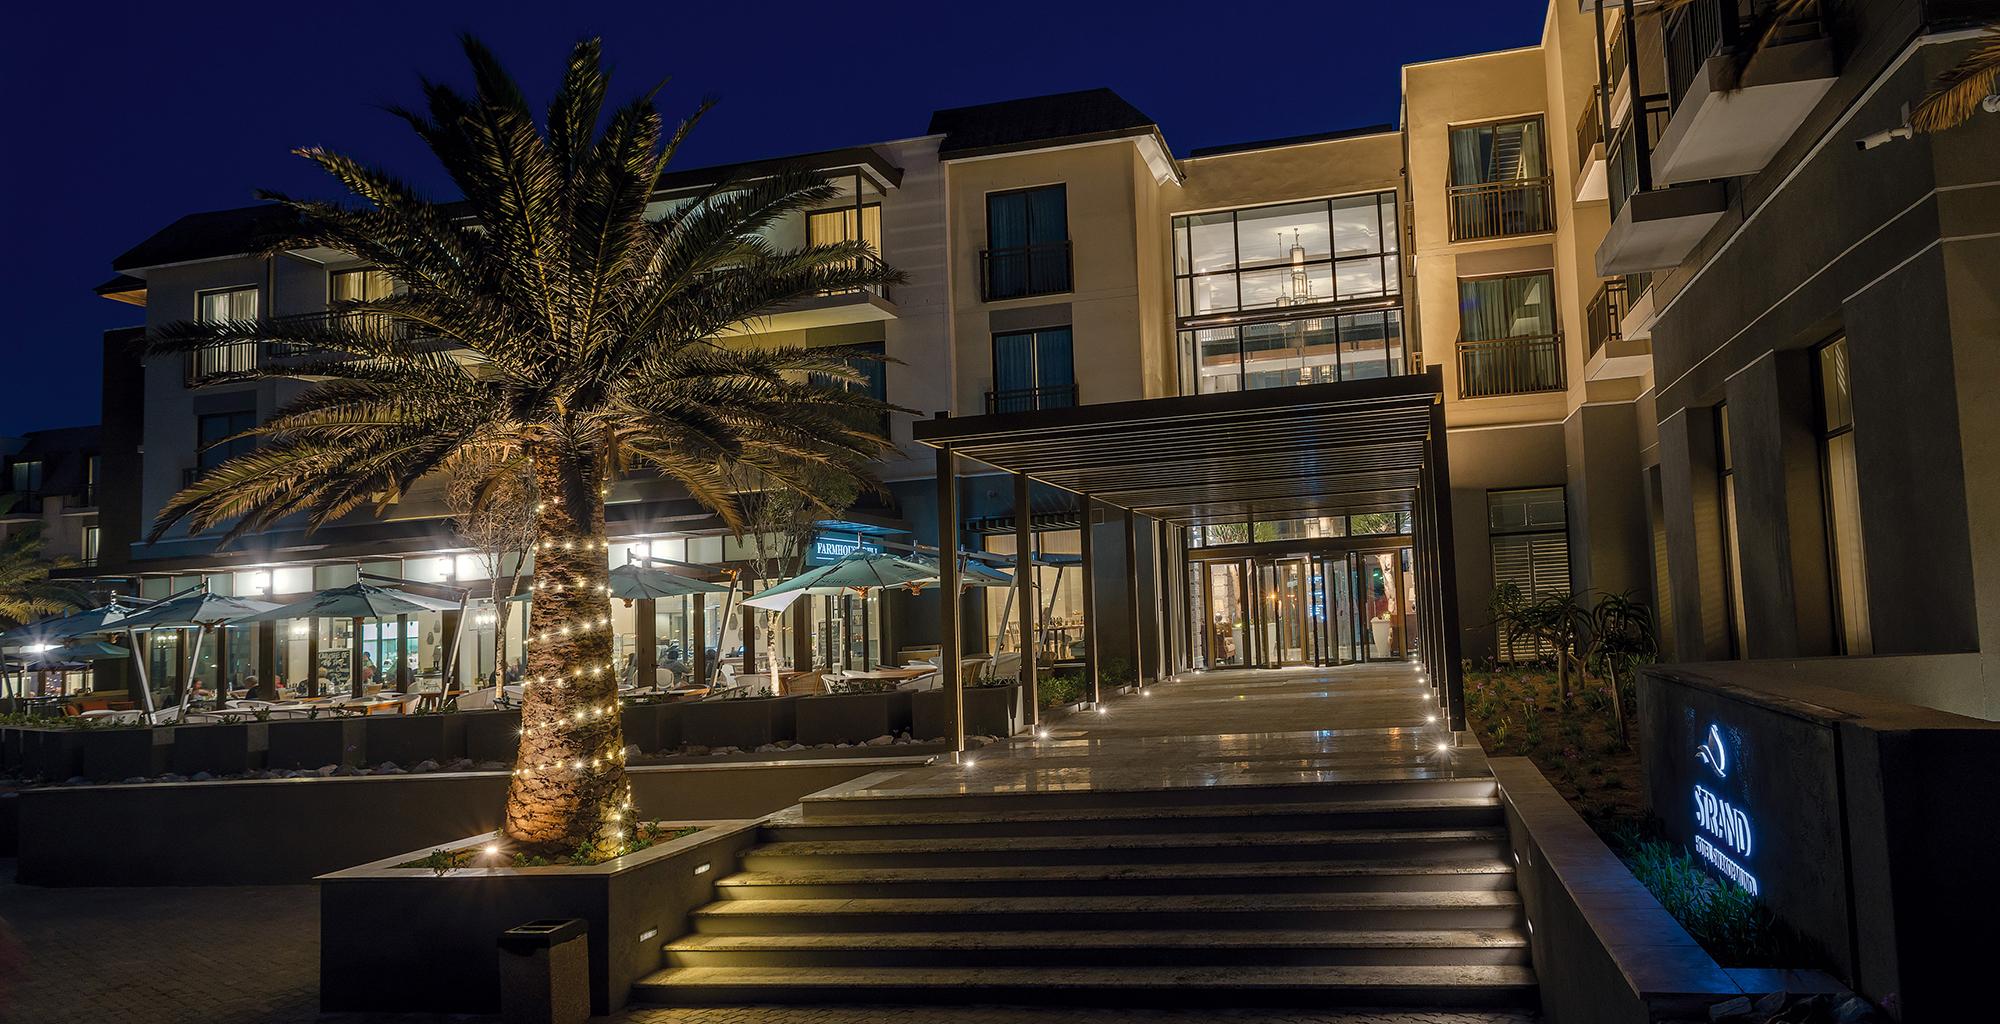 Namibia-Strand-Hotel-Swakopmund-Exterior